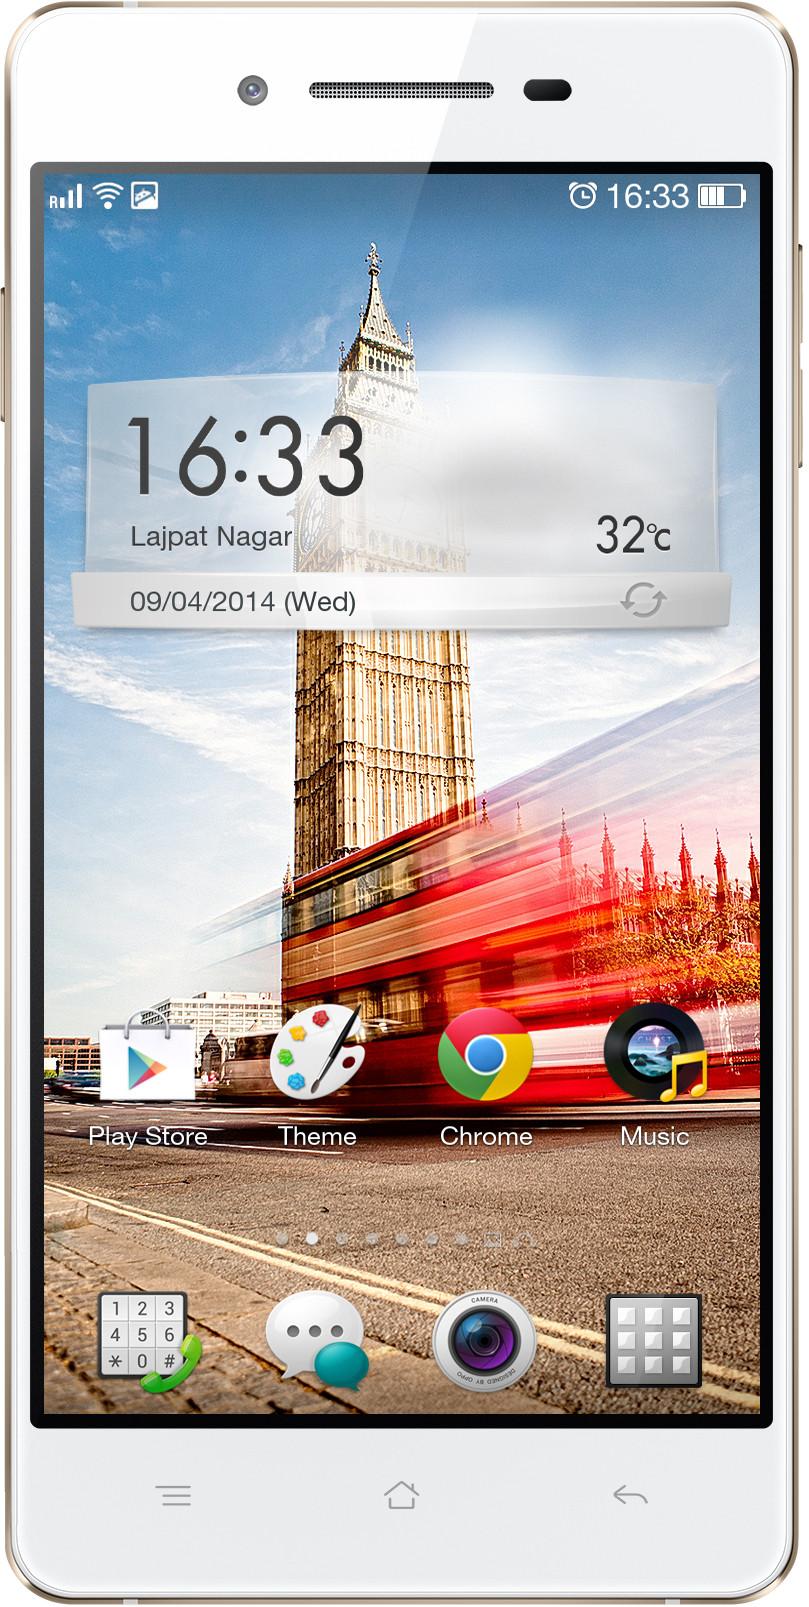 Oppo R1 (1GB RAM, 16GB)